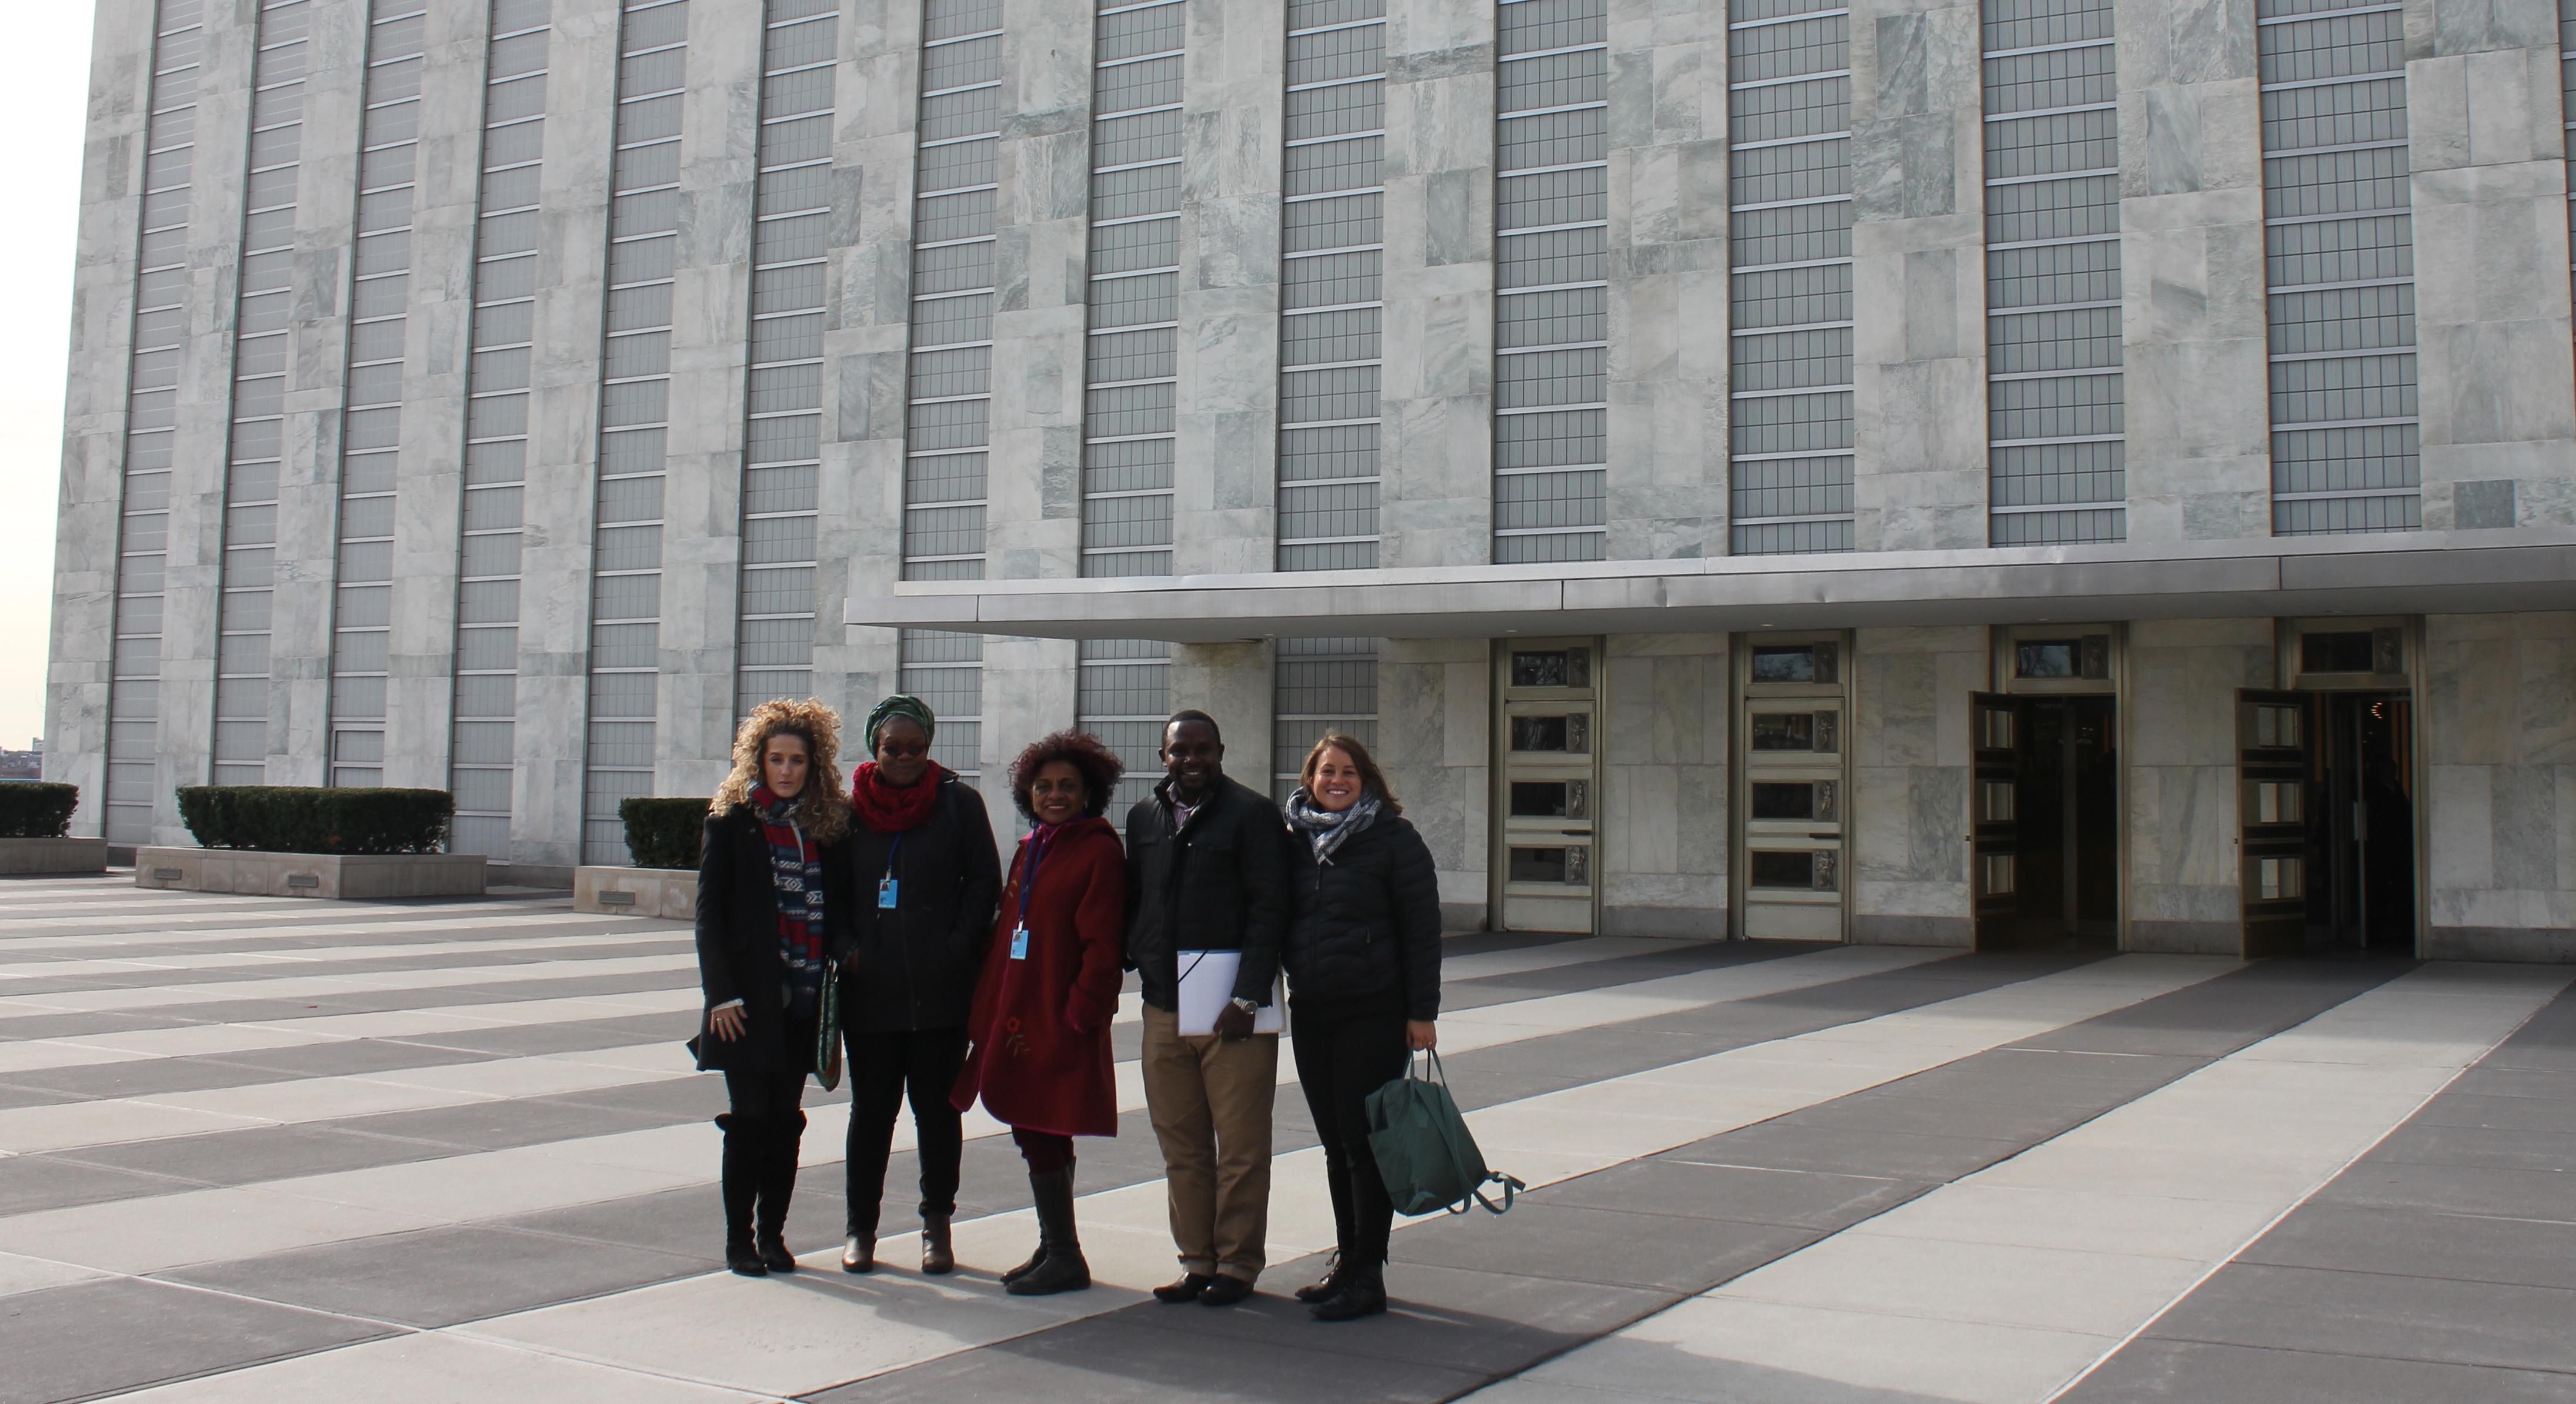 Från vänster: Lendita Ajdani, Jennipher Sakala, Maria Guerra, Jonathan Kioko, Liinu Diaz Rämö